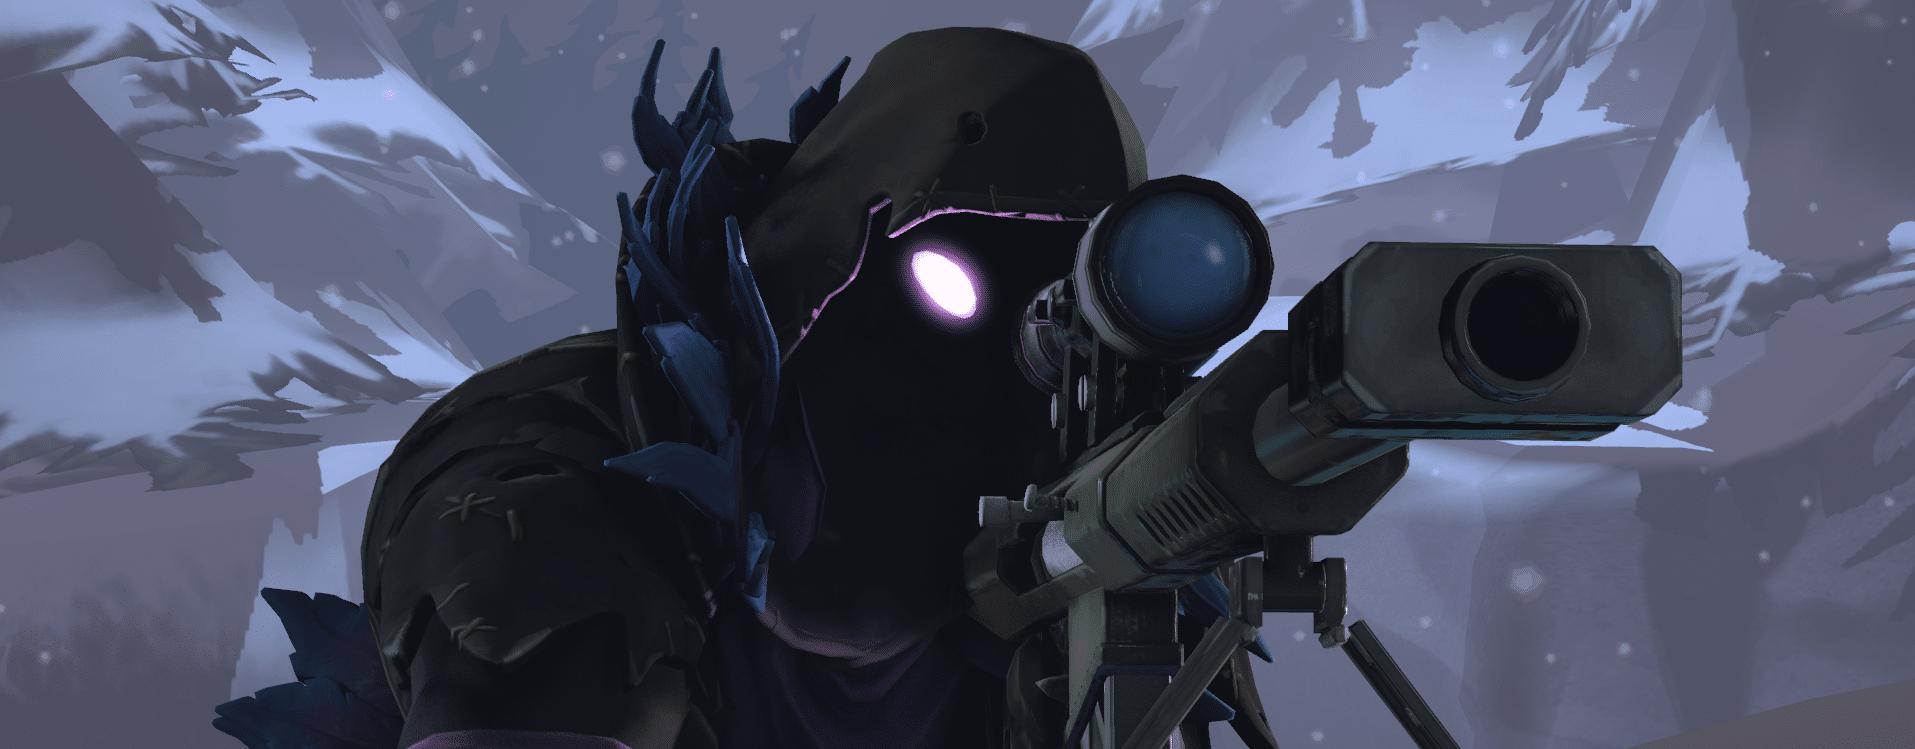 Fortnite Glowing Sniper